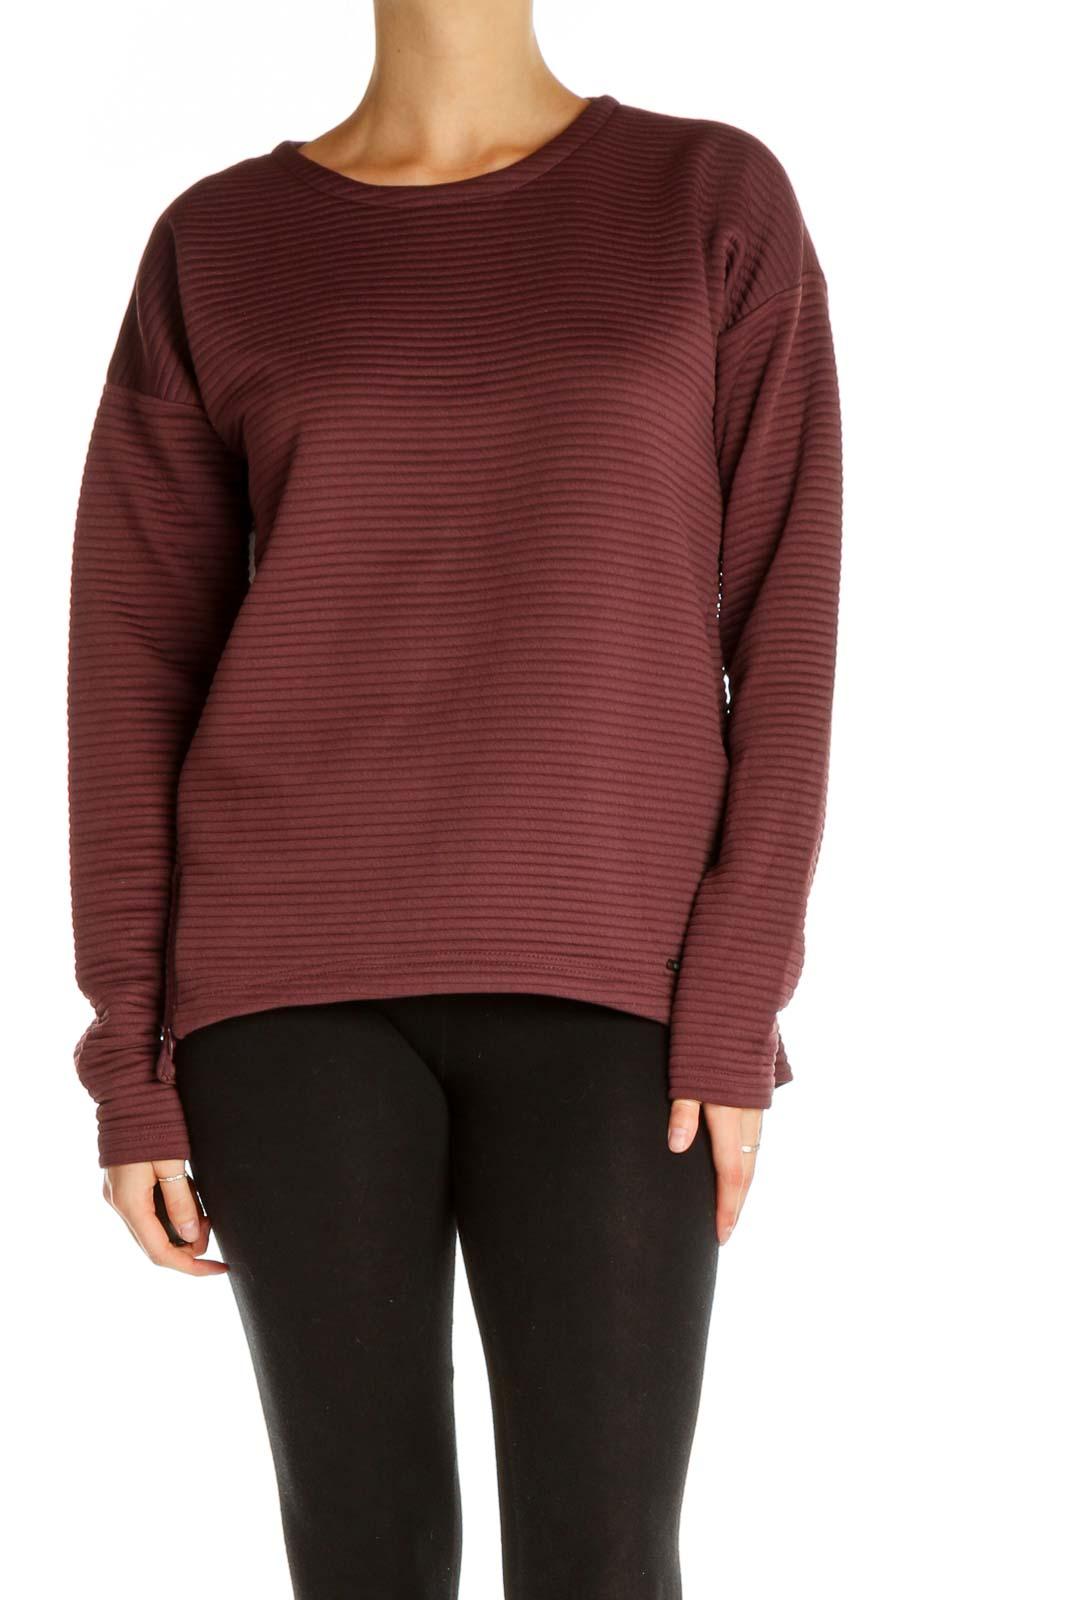 Red Striped Sweatshirt Front